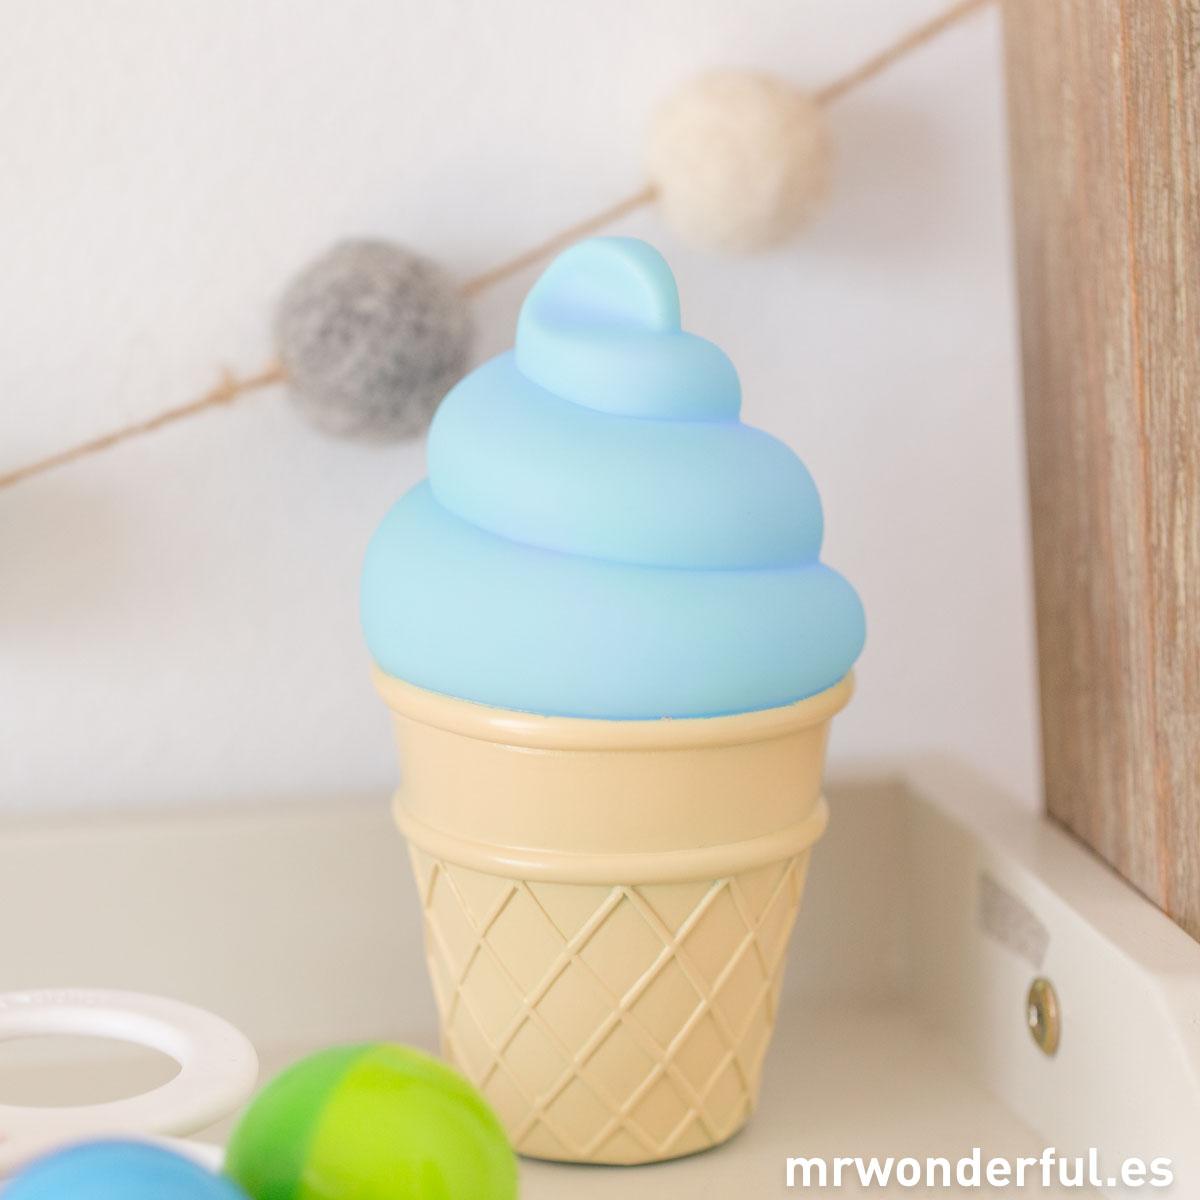 mrwonderful_PRA02817_Luz-nocturna-Icecream-color-azul-20